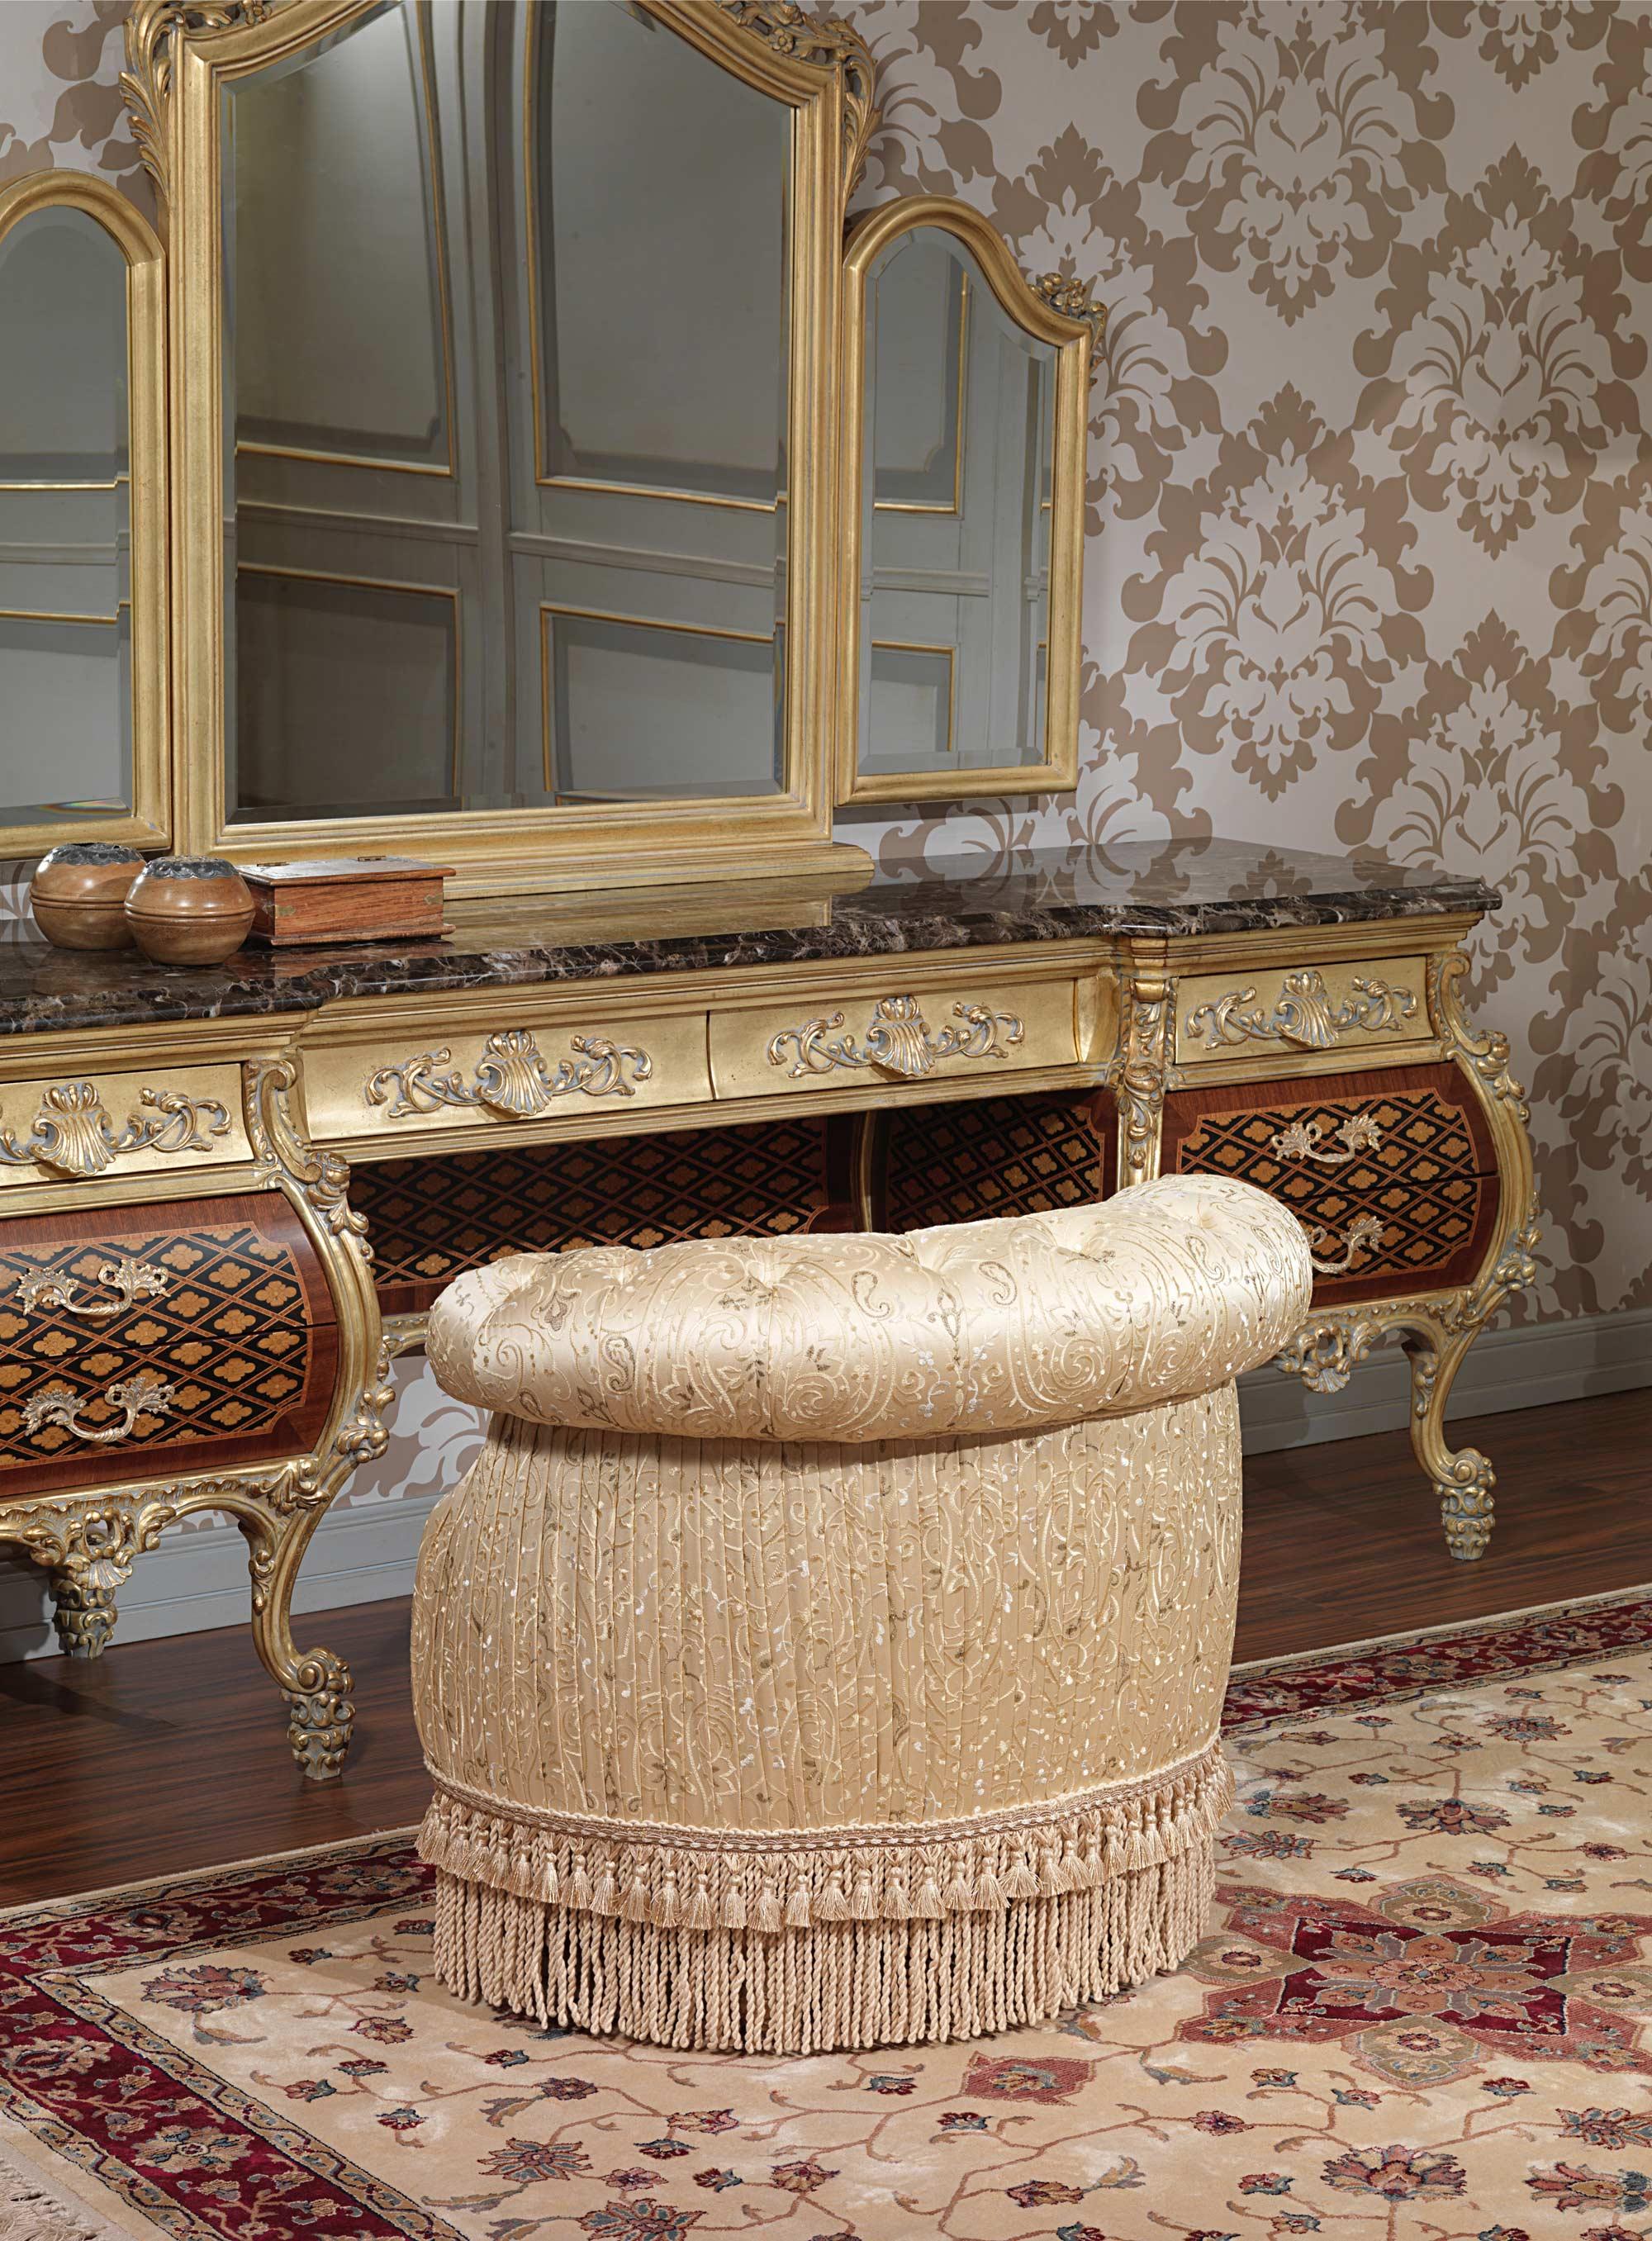 Luxury bedroom small armchair art 2011 vimercati for Luxury small bedrooms